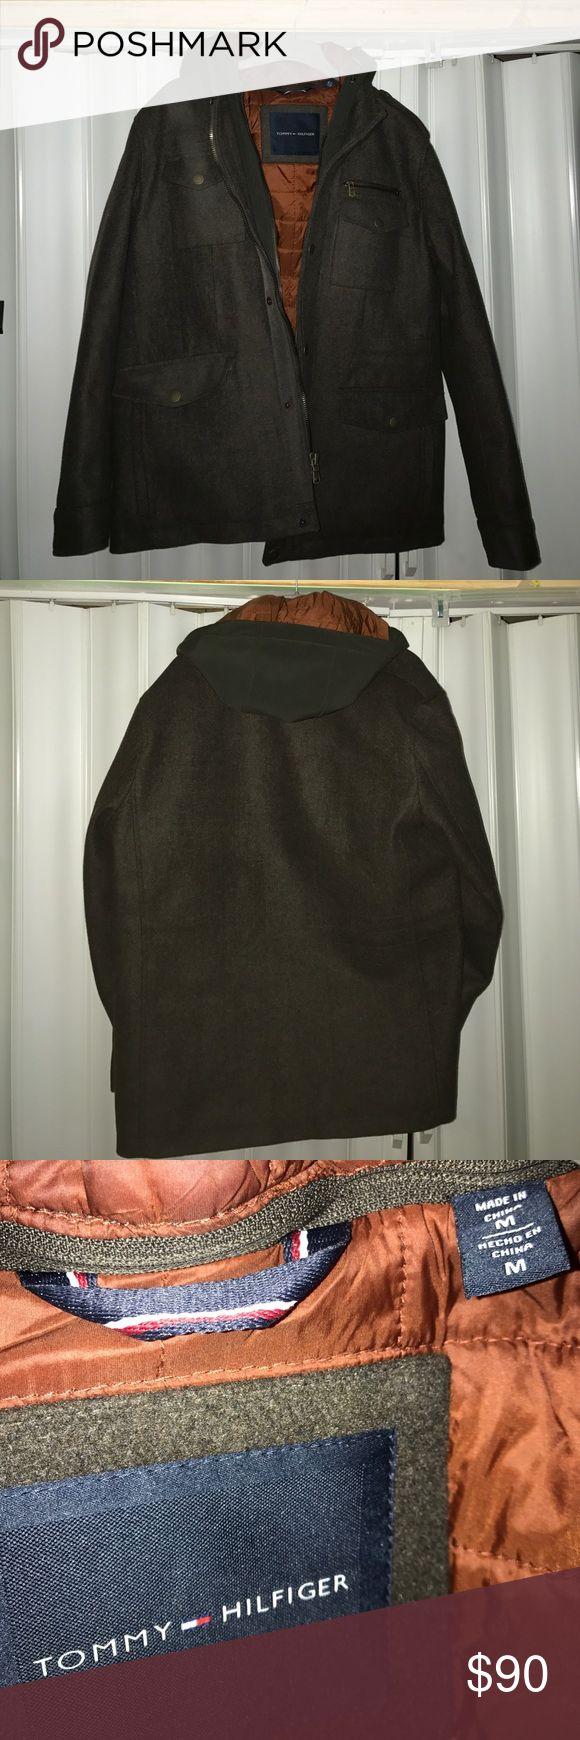 Tommy Hilfiger Men's wool jacket Dark grey wool jacket, weatherproof hood, inside zipper pocket, worn once, very good condition, very warm Tommy Hilfiger Jackets & Coats Pea Coats